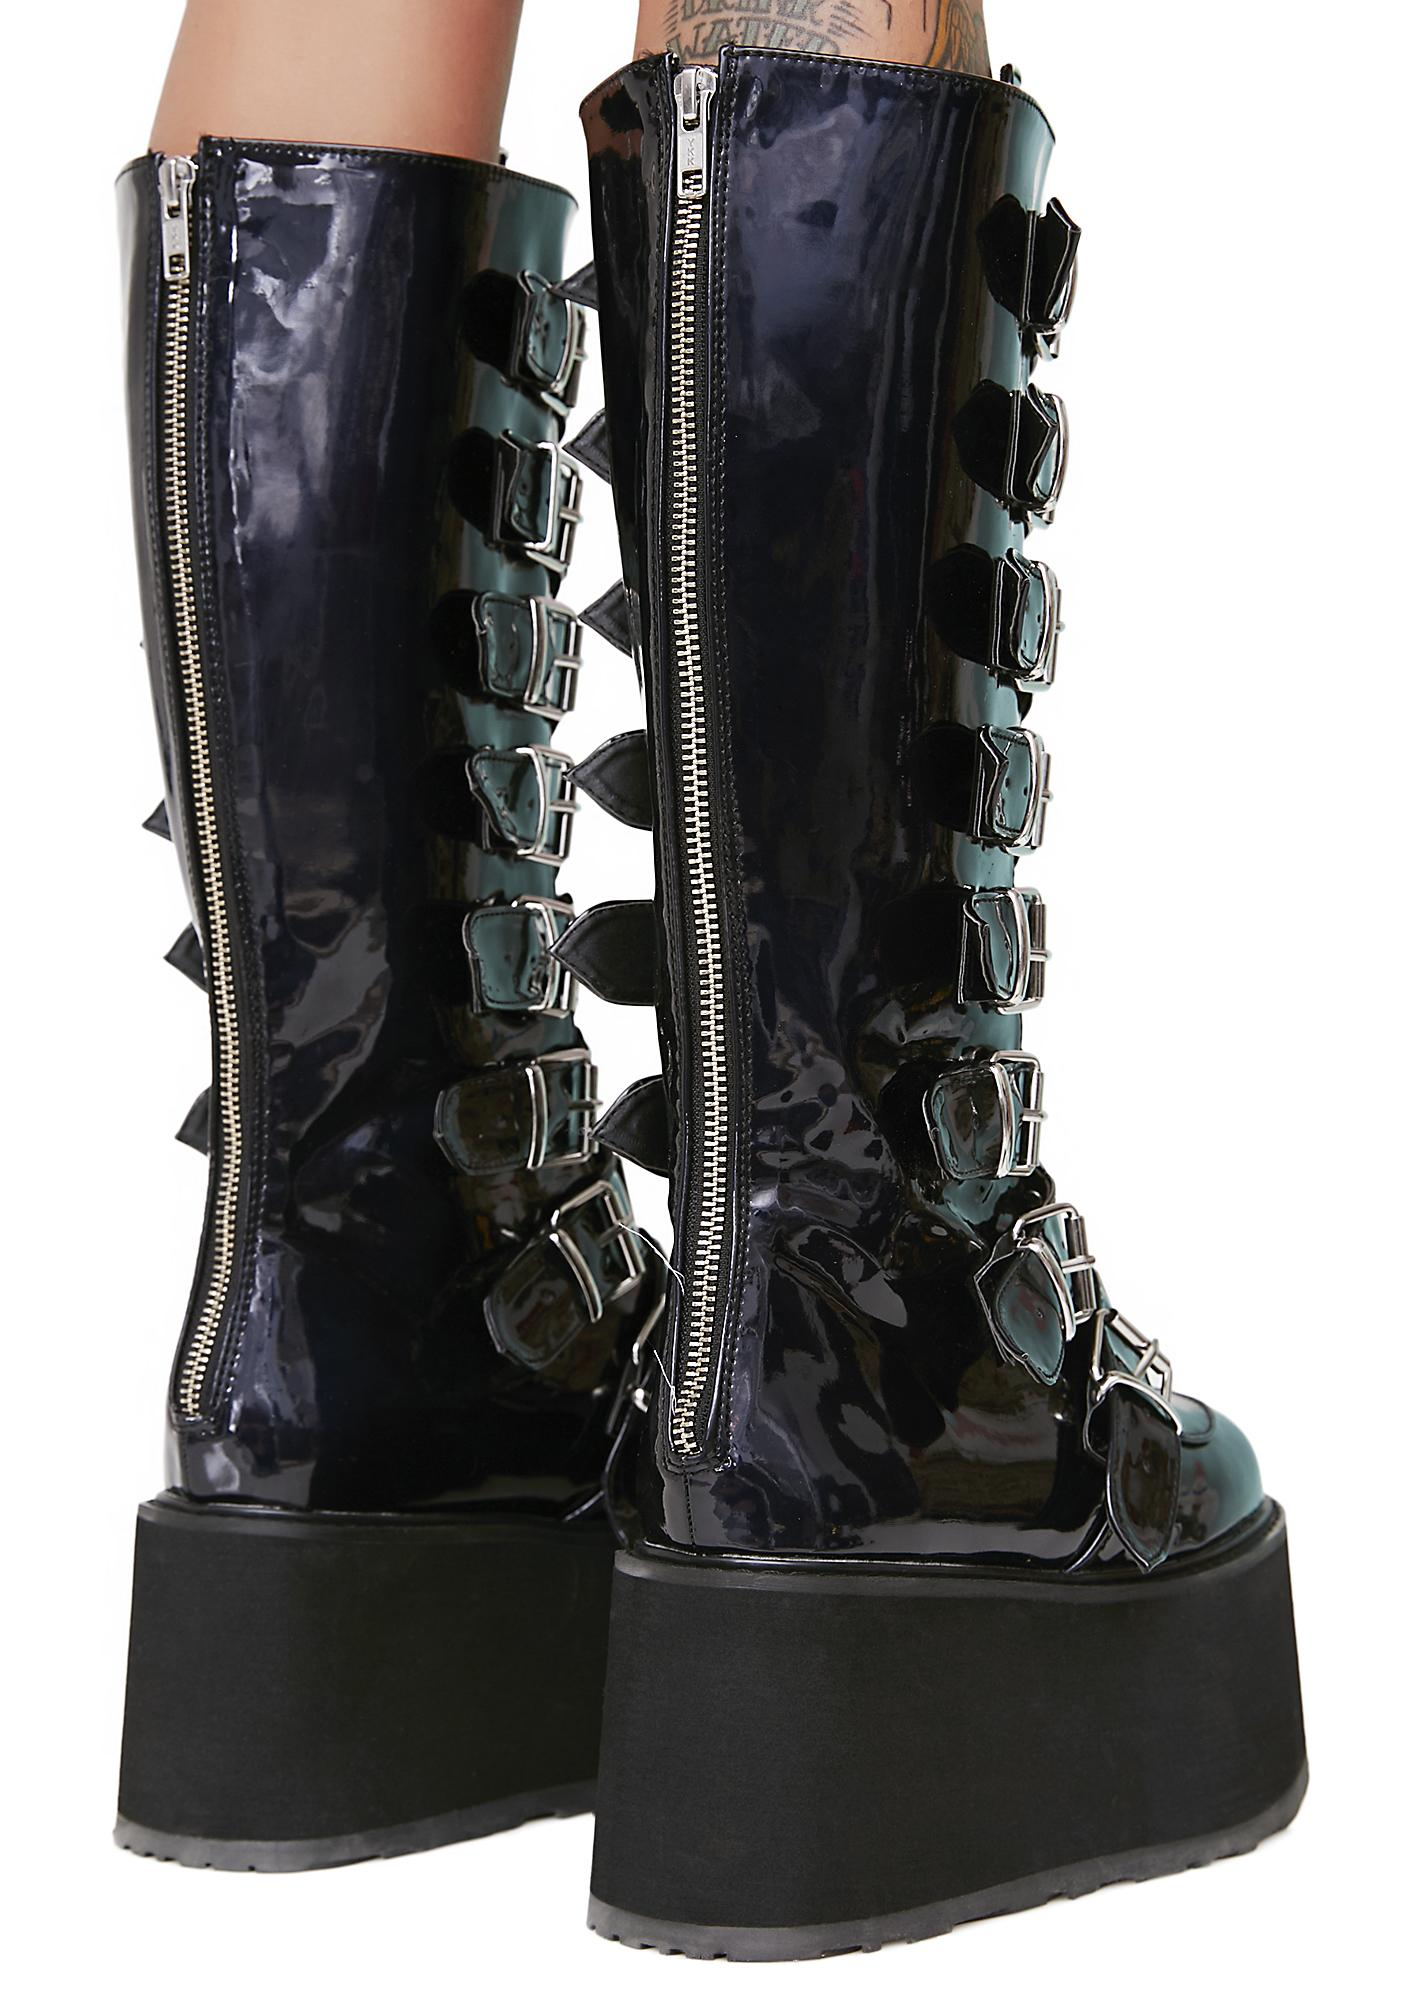 Demonia Hologram Morpheus Platform Boots